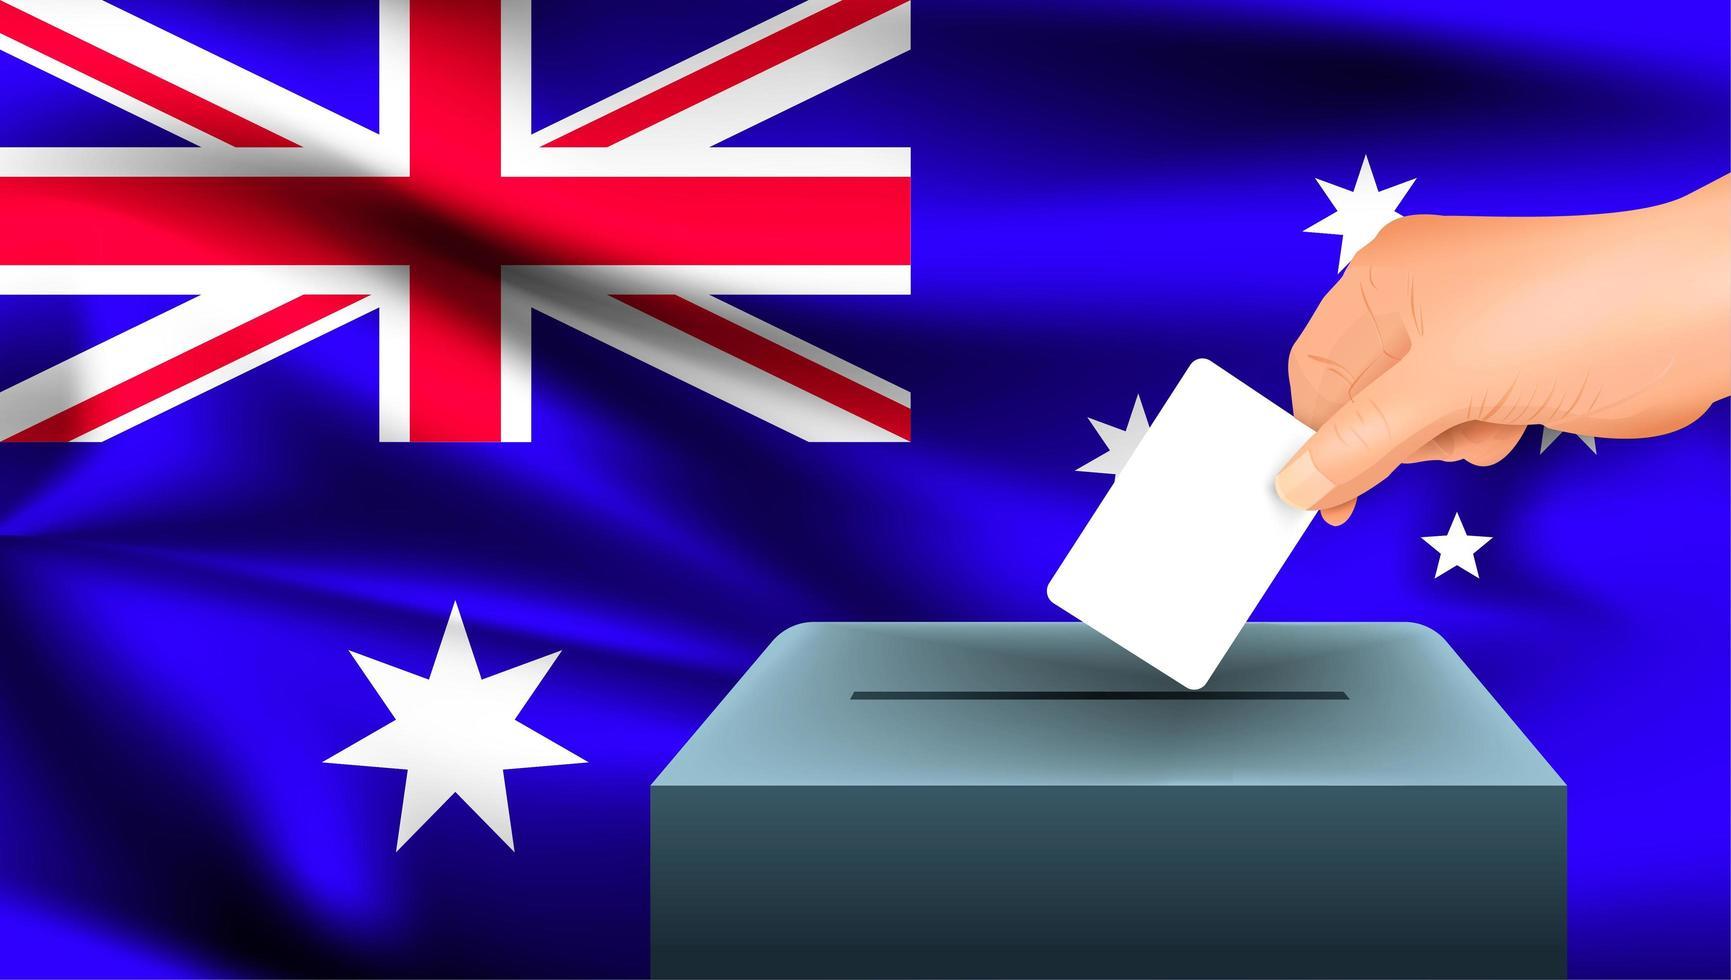 Hand putting ballot into box with Australian flag  vector